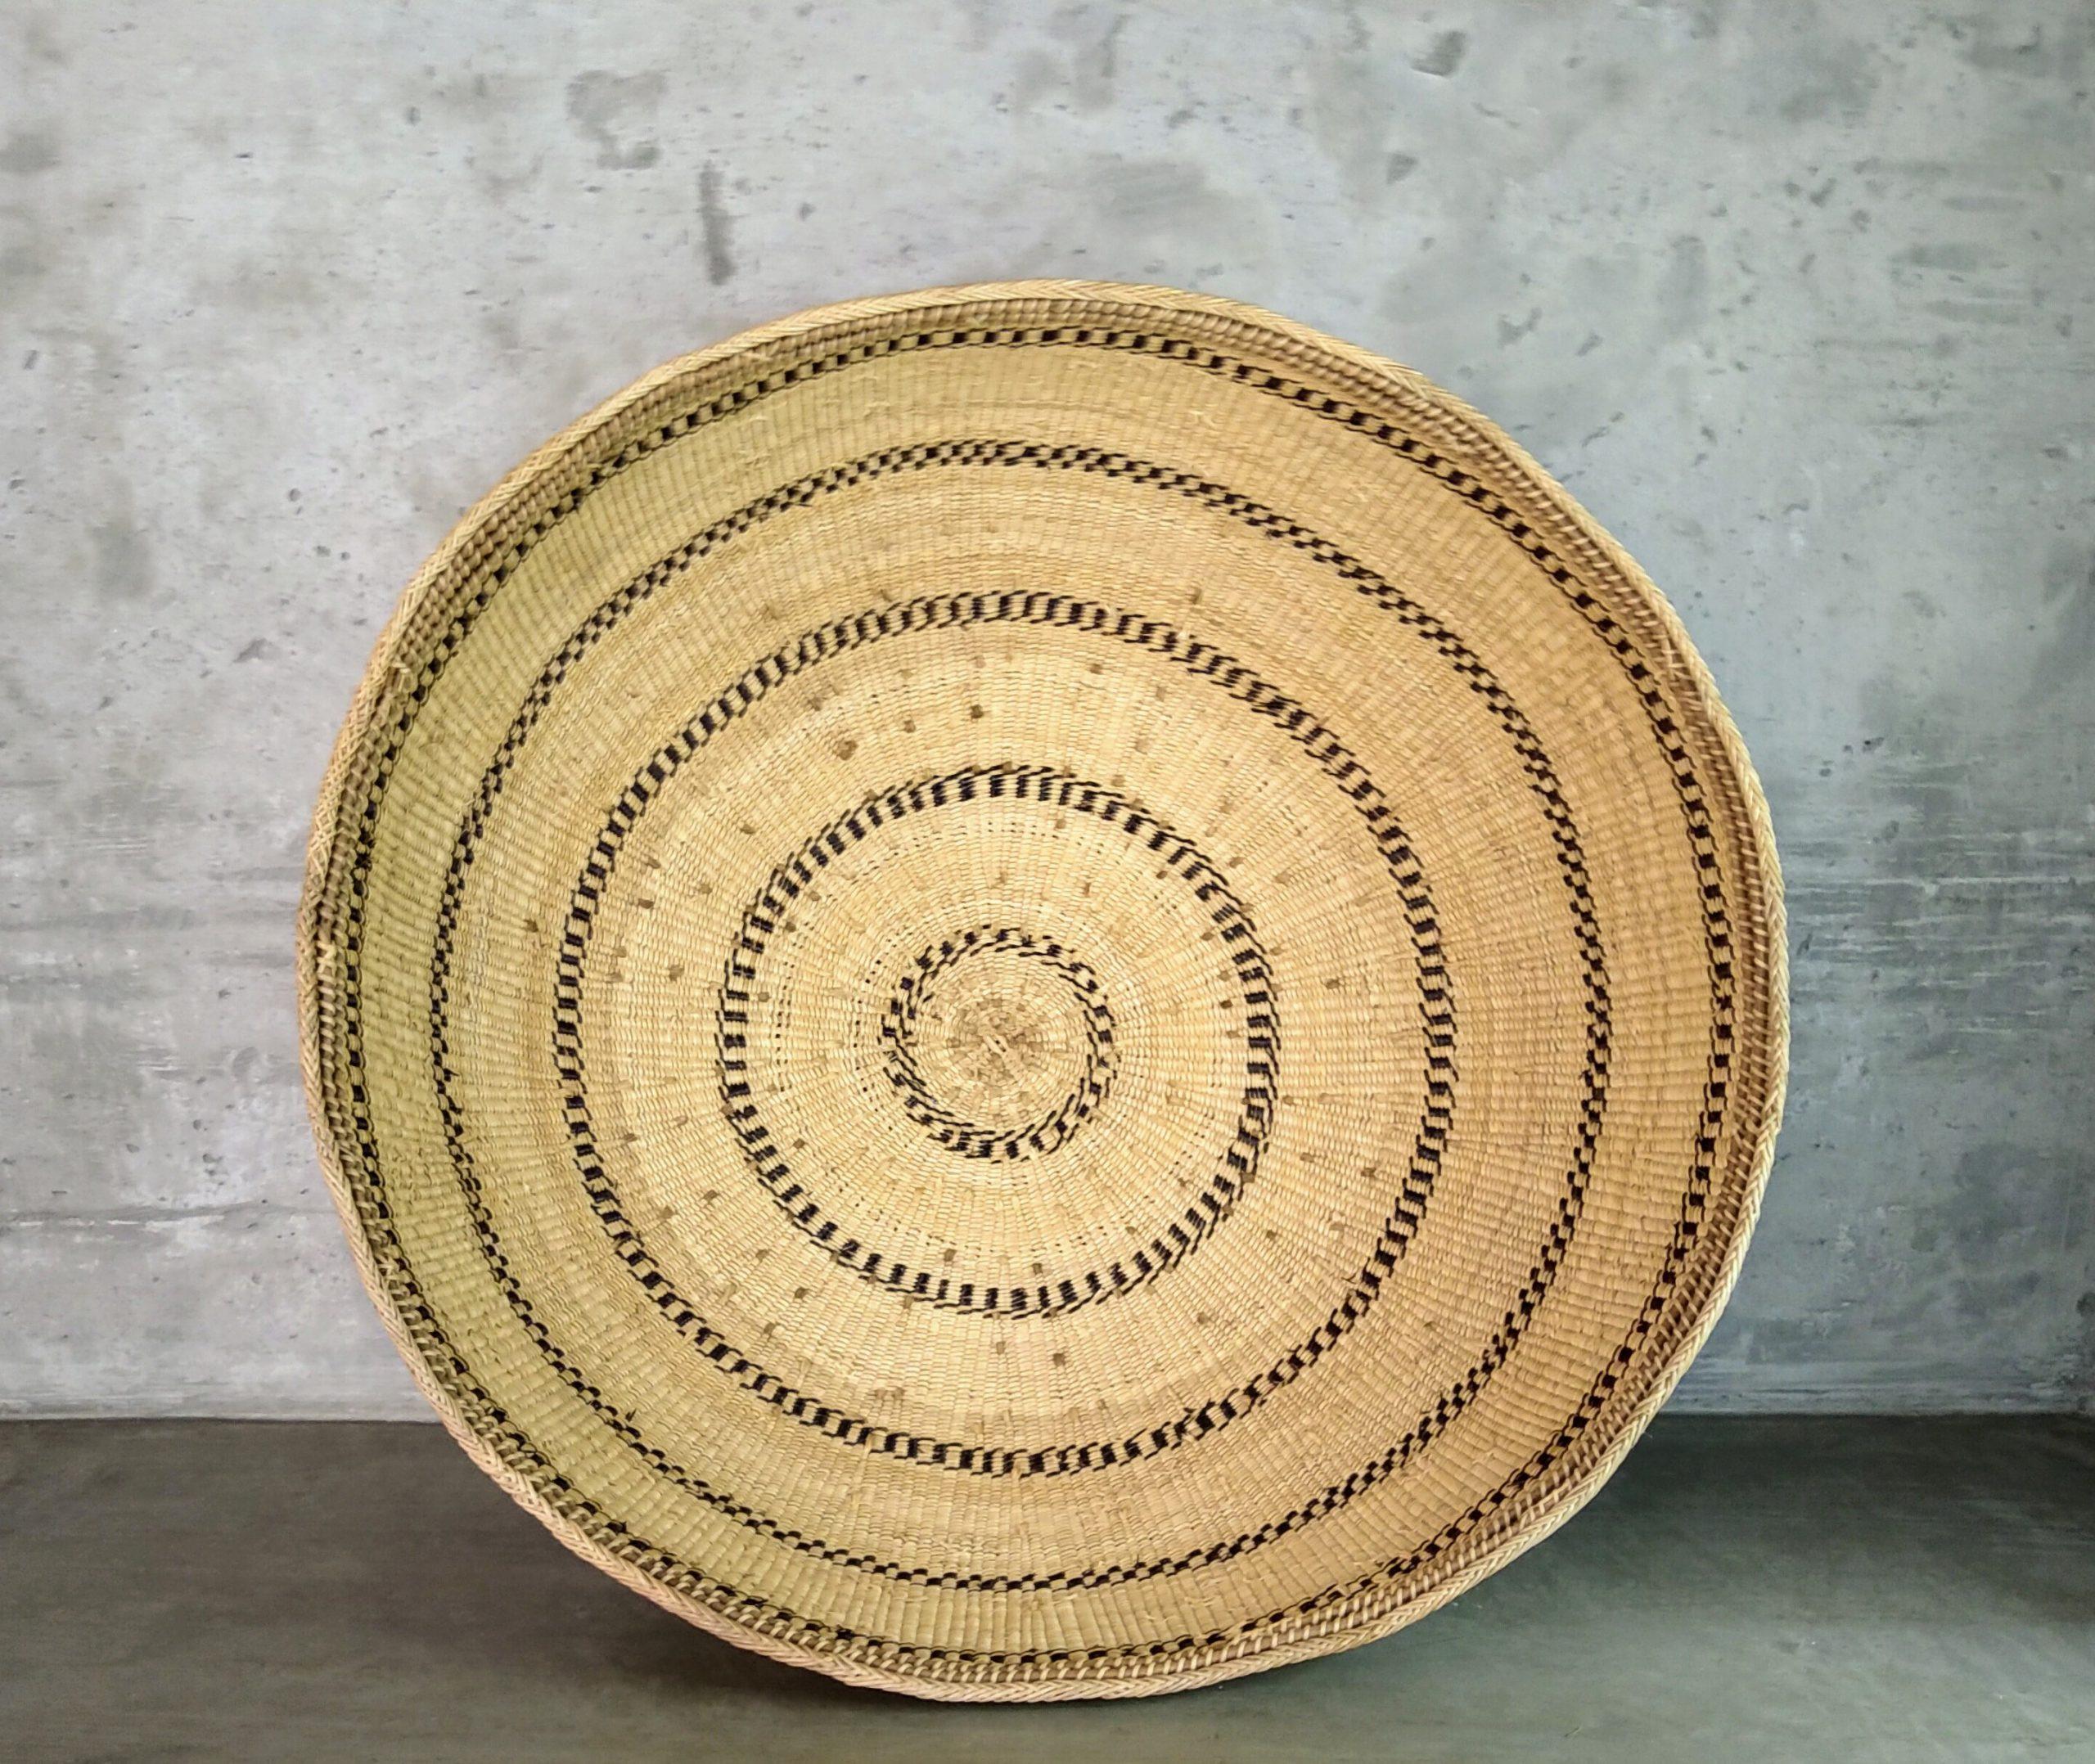 Cesto Indigena Yanomami Xotehe